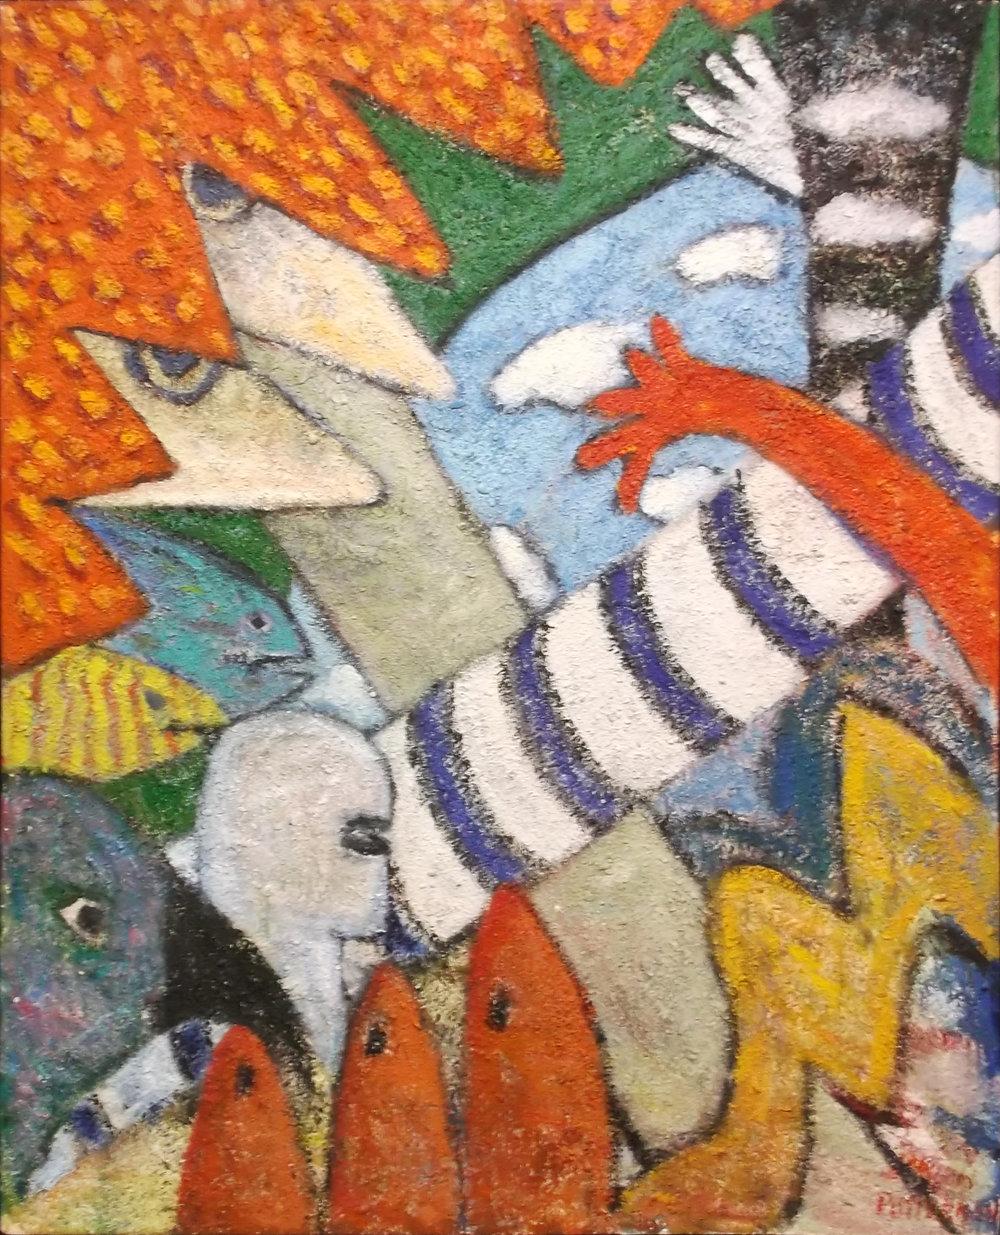 Bird, Hand & Man Series, Acrylic & Sand, 60x48.jpg